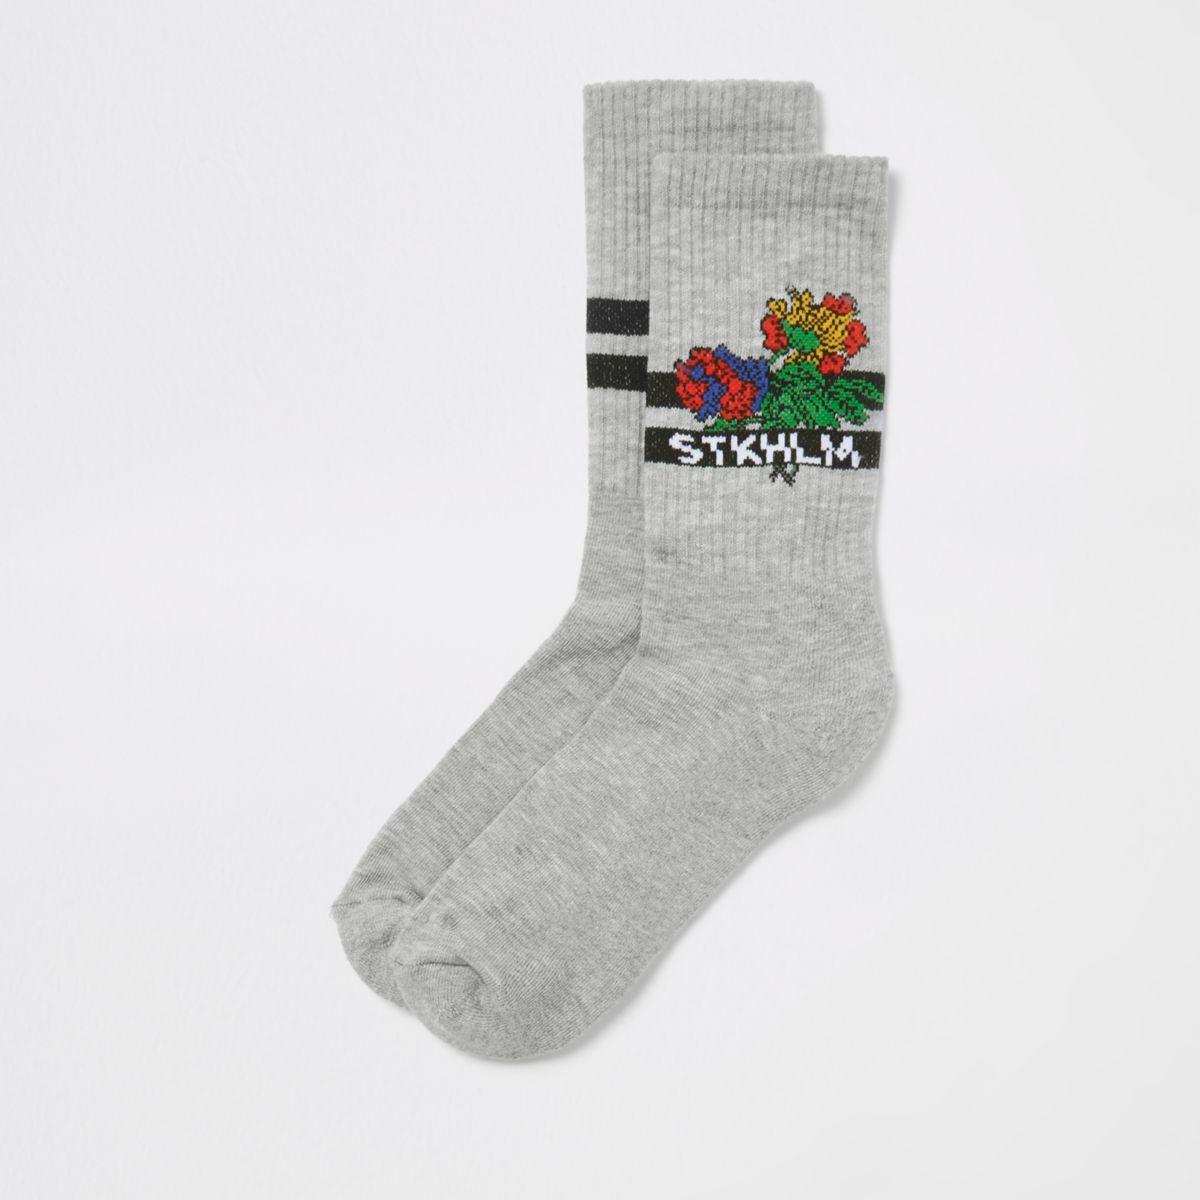 Grey floral 'Stkhlm' socks